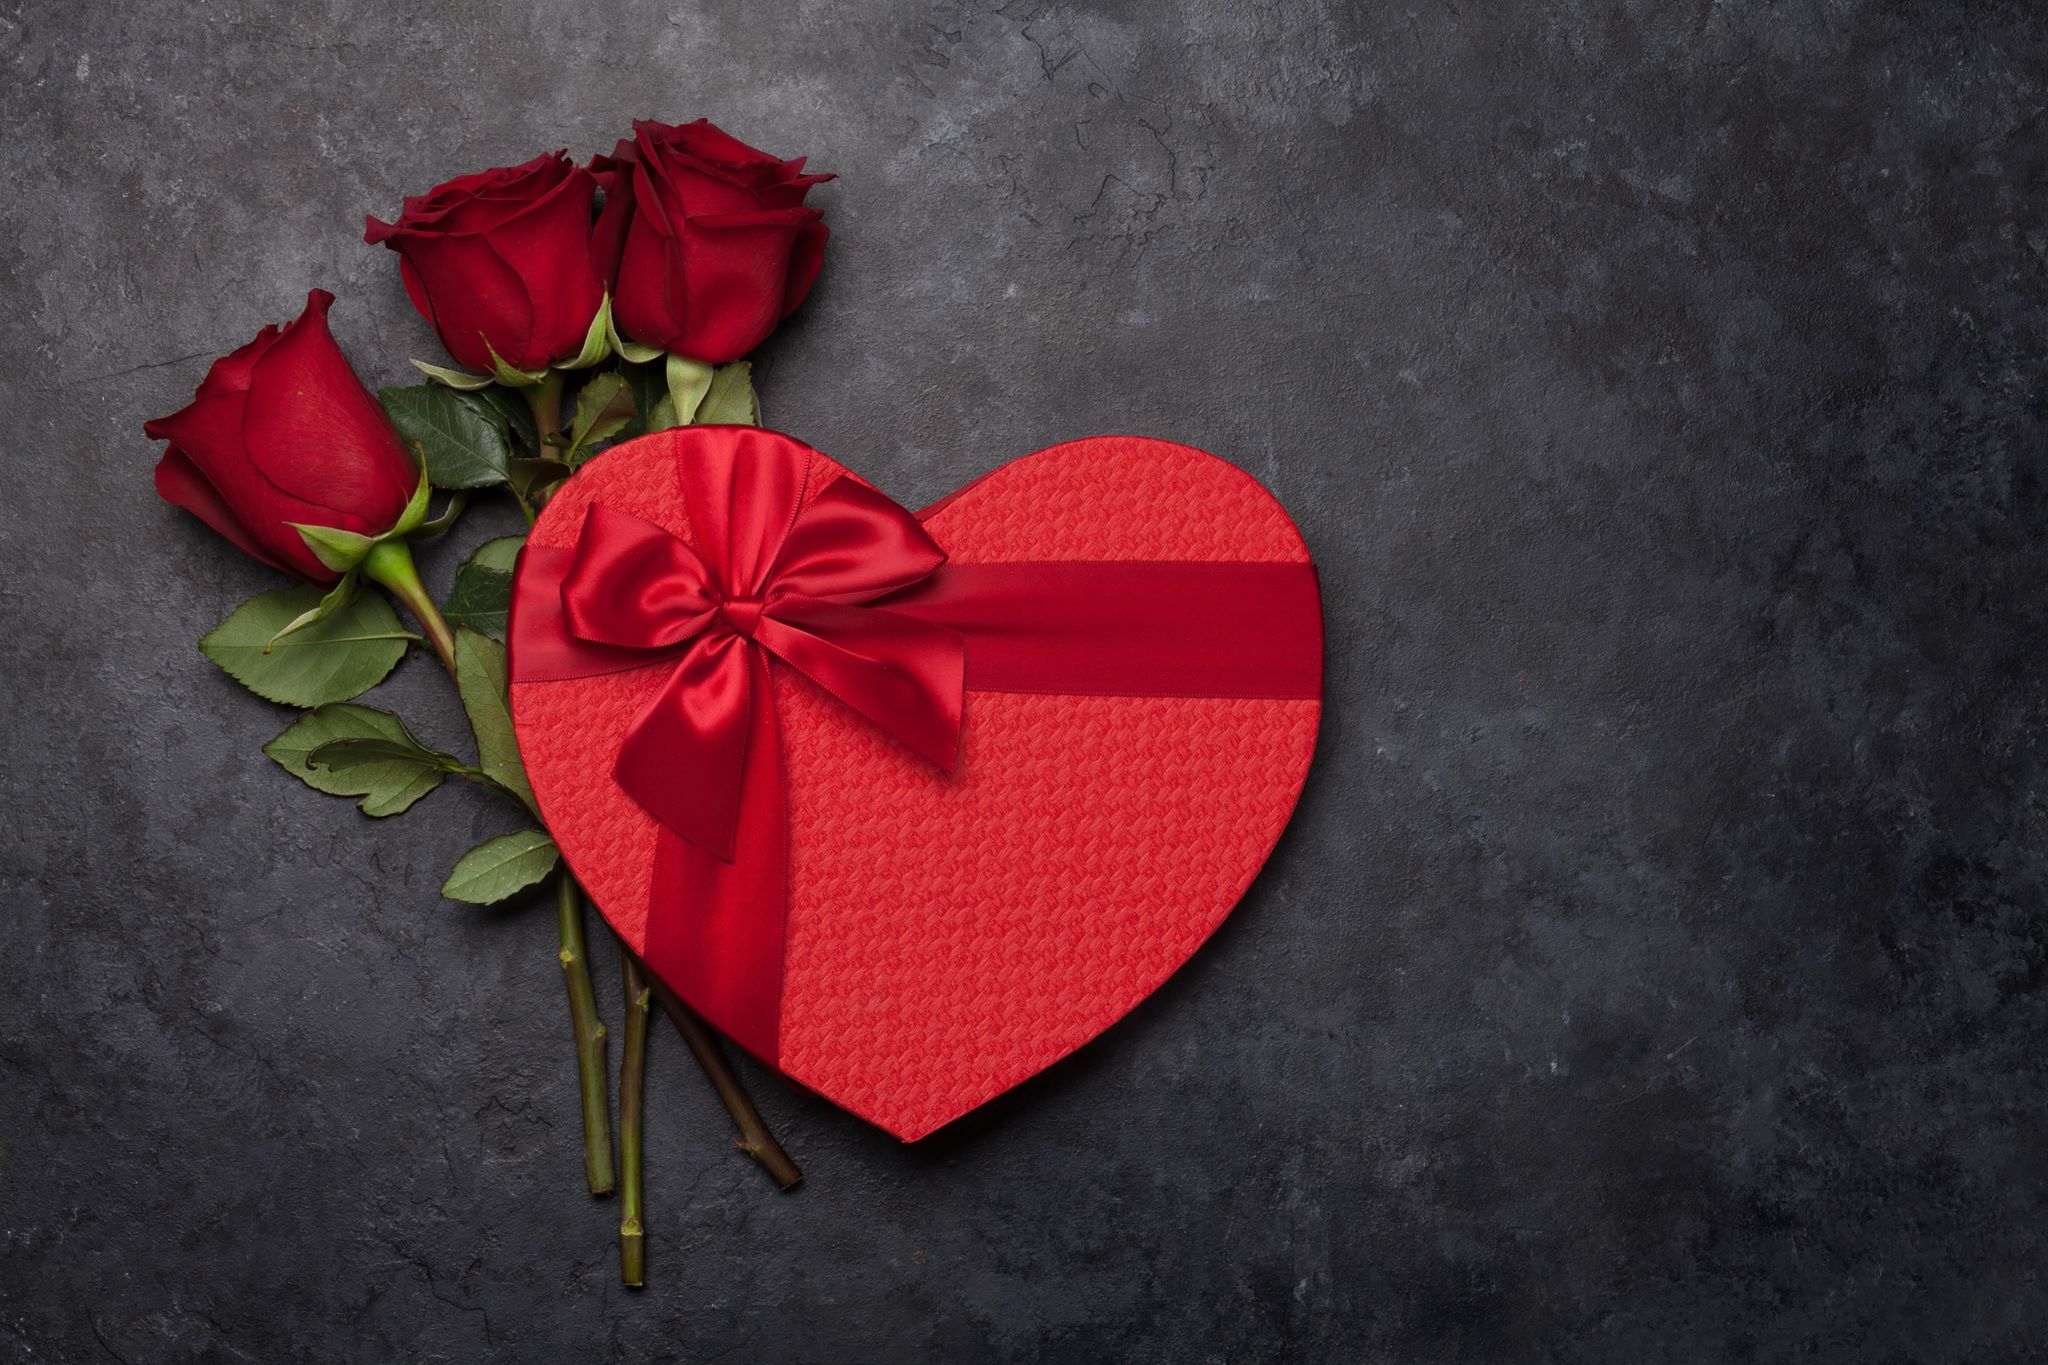 Valentines day images 12 صور عيد الحب